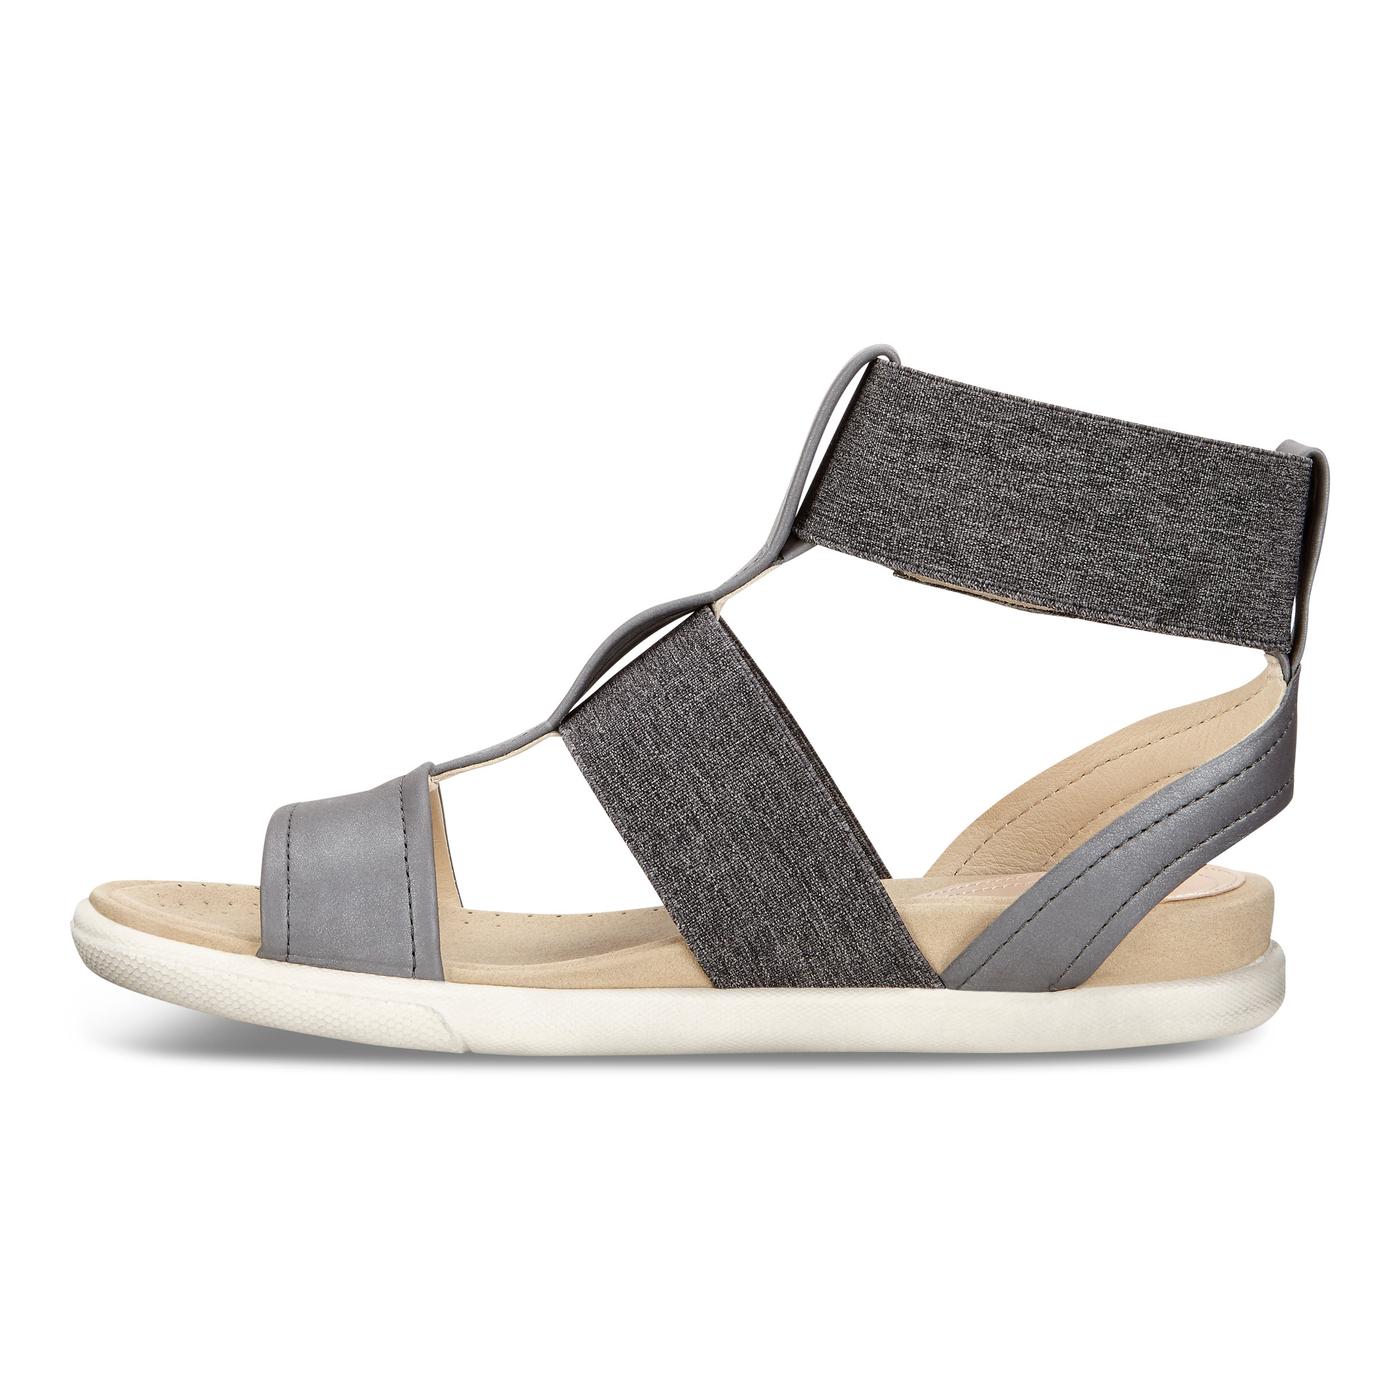 117e062314f ECCO Damara Women s Ankle Strap Sandal